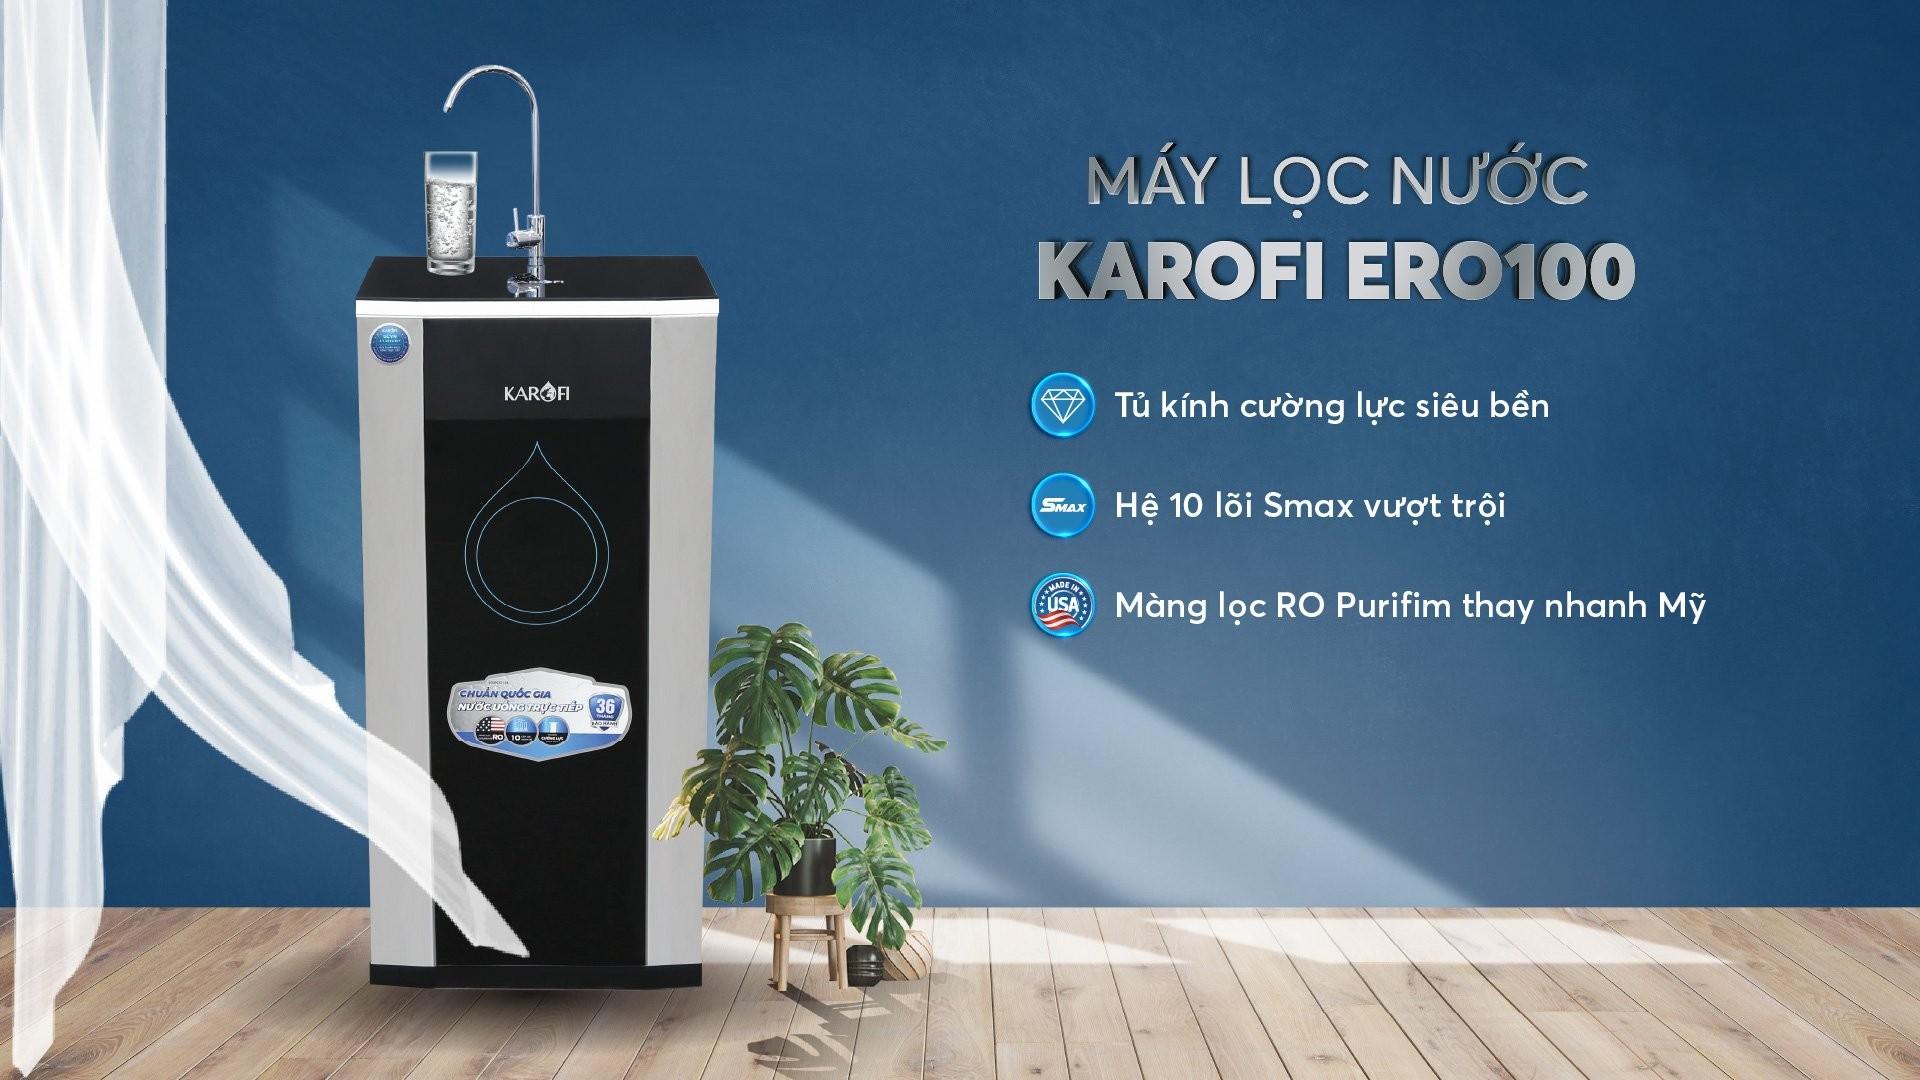 Máy lọc nước karofi ERO100   Karofi.com